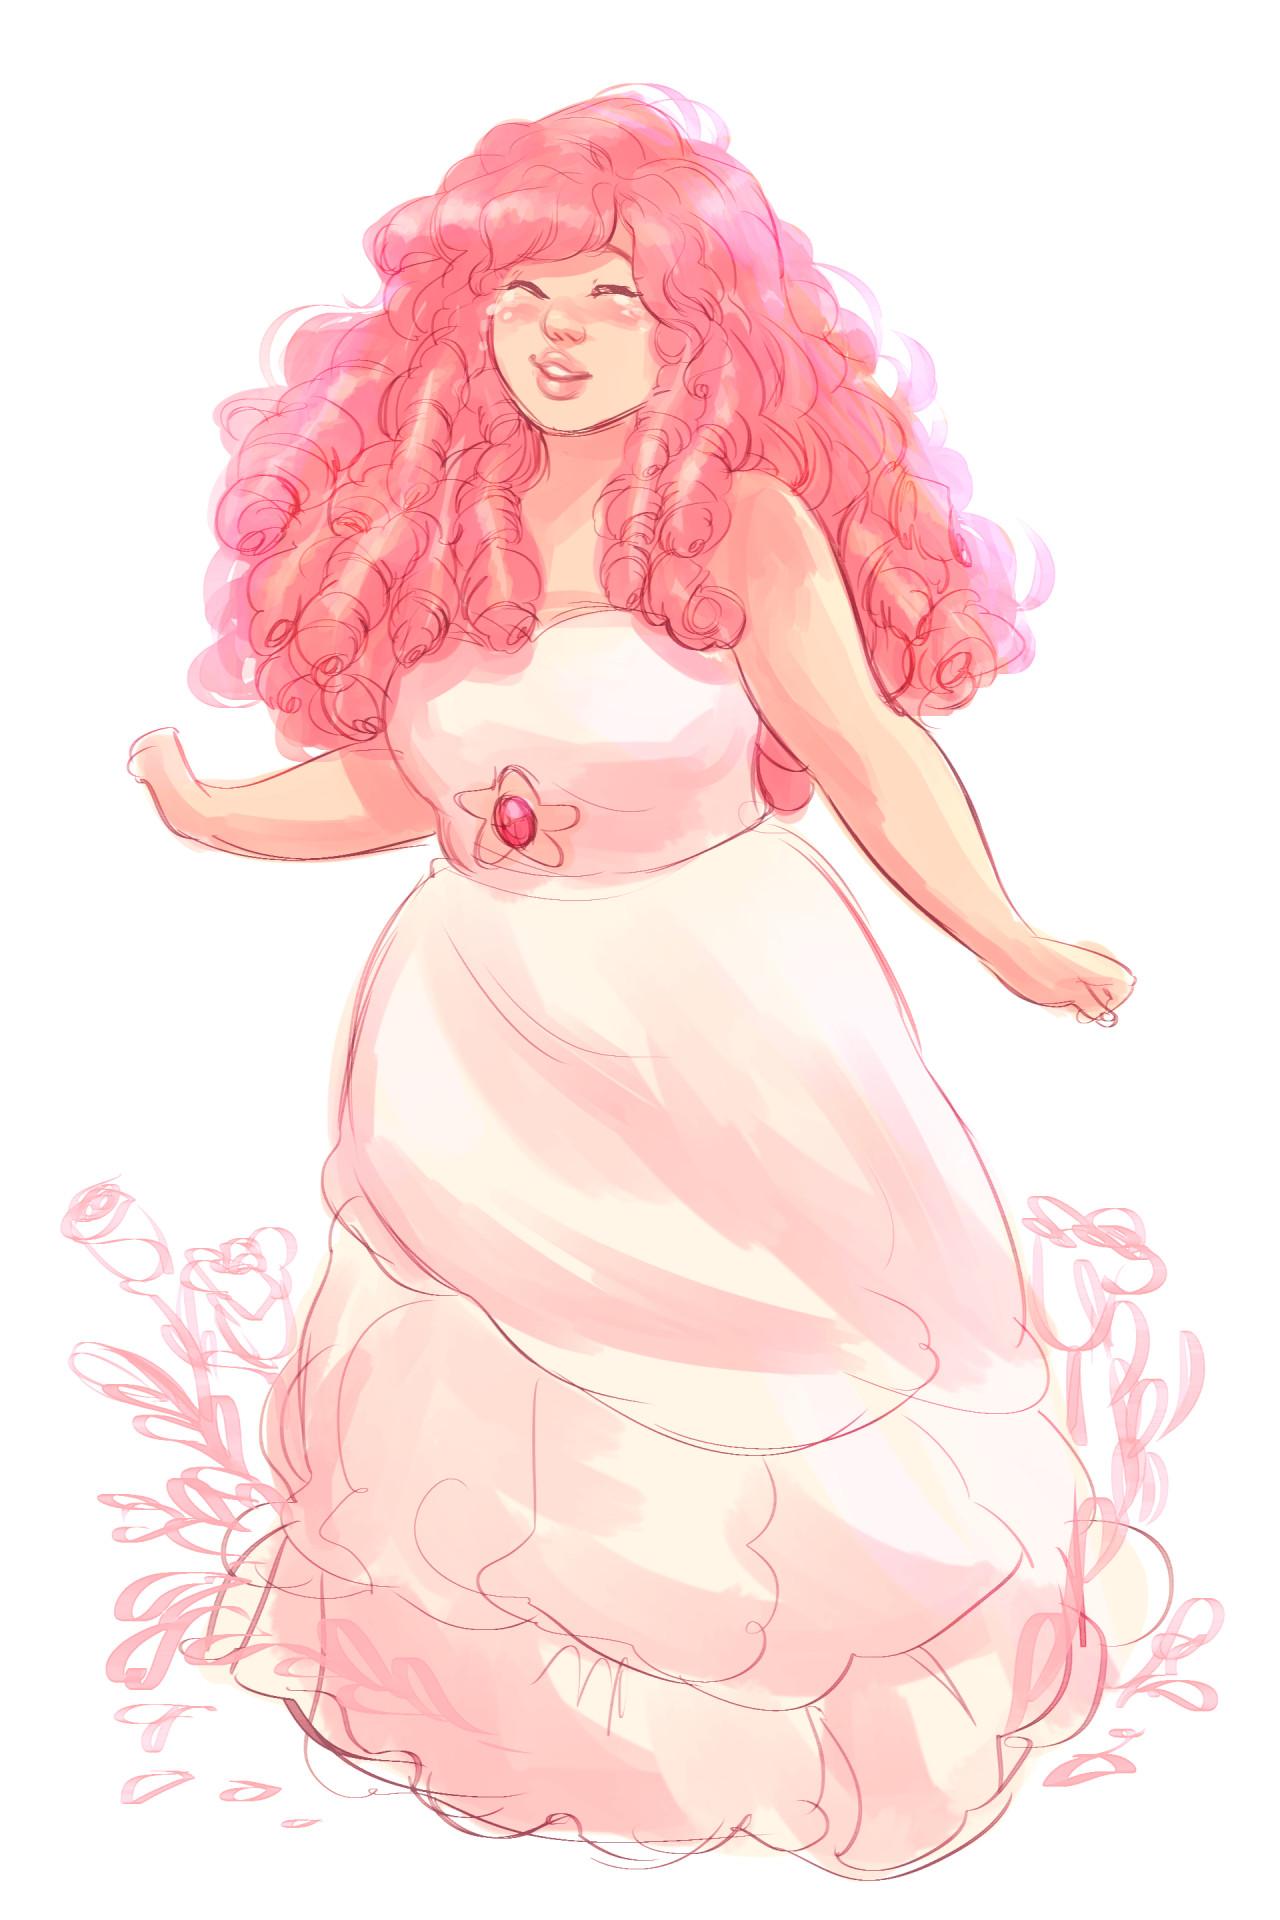 rose q by bevsi